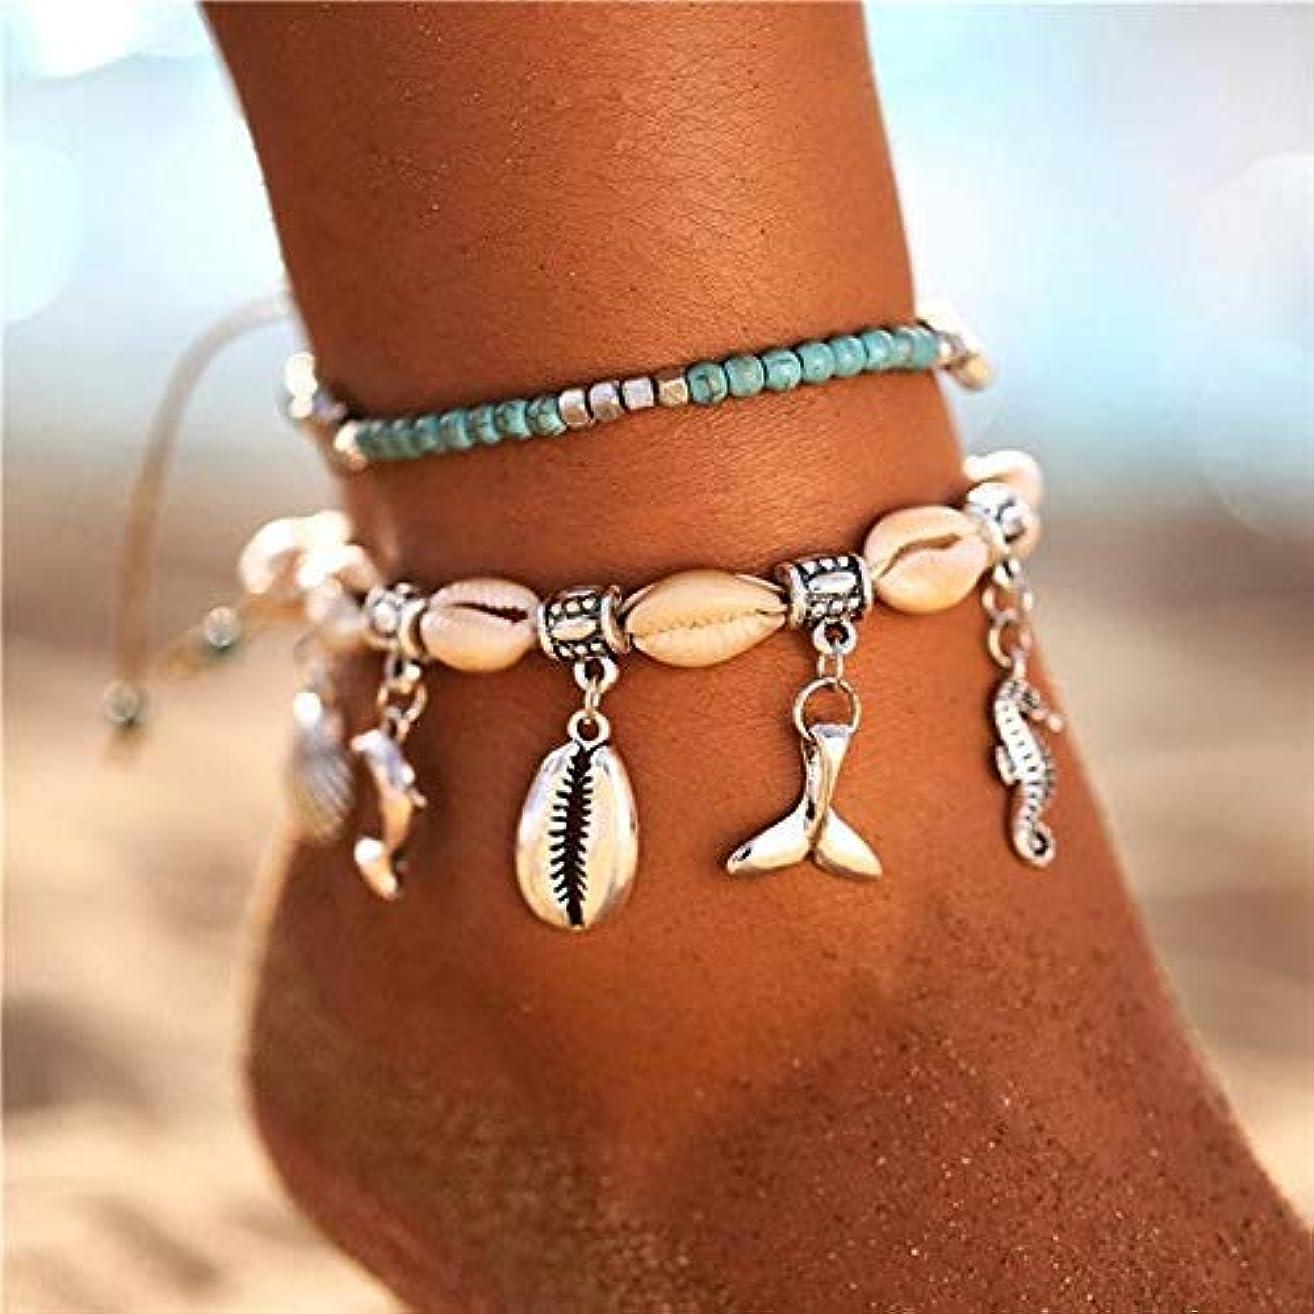 Anklet Bracelet - Anklet Cowrie Cowry For Women New Stone Beads Shell Anklet Bracelet